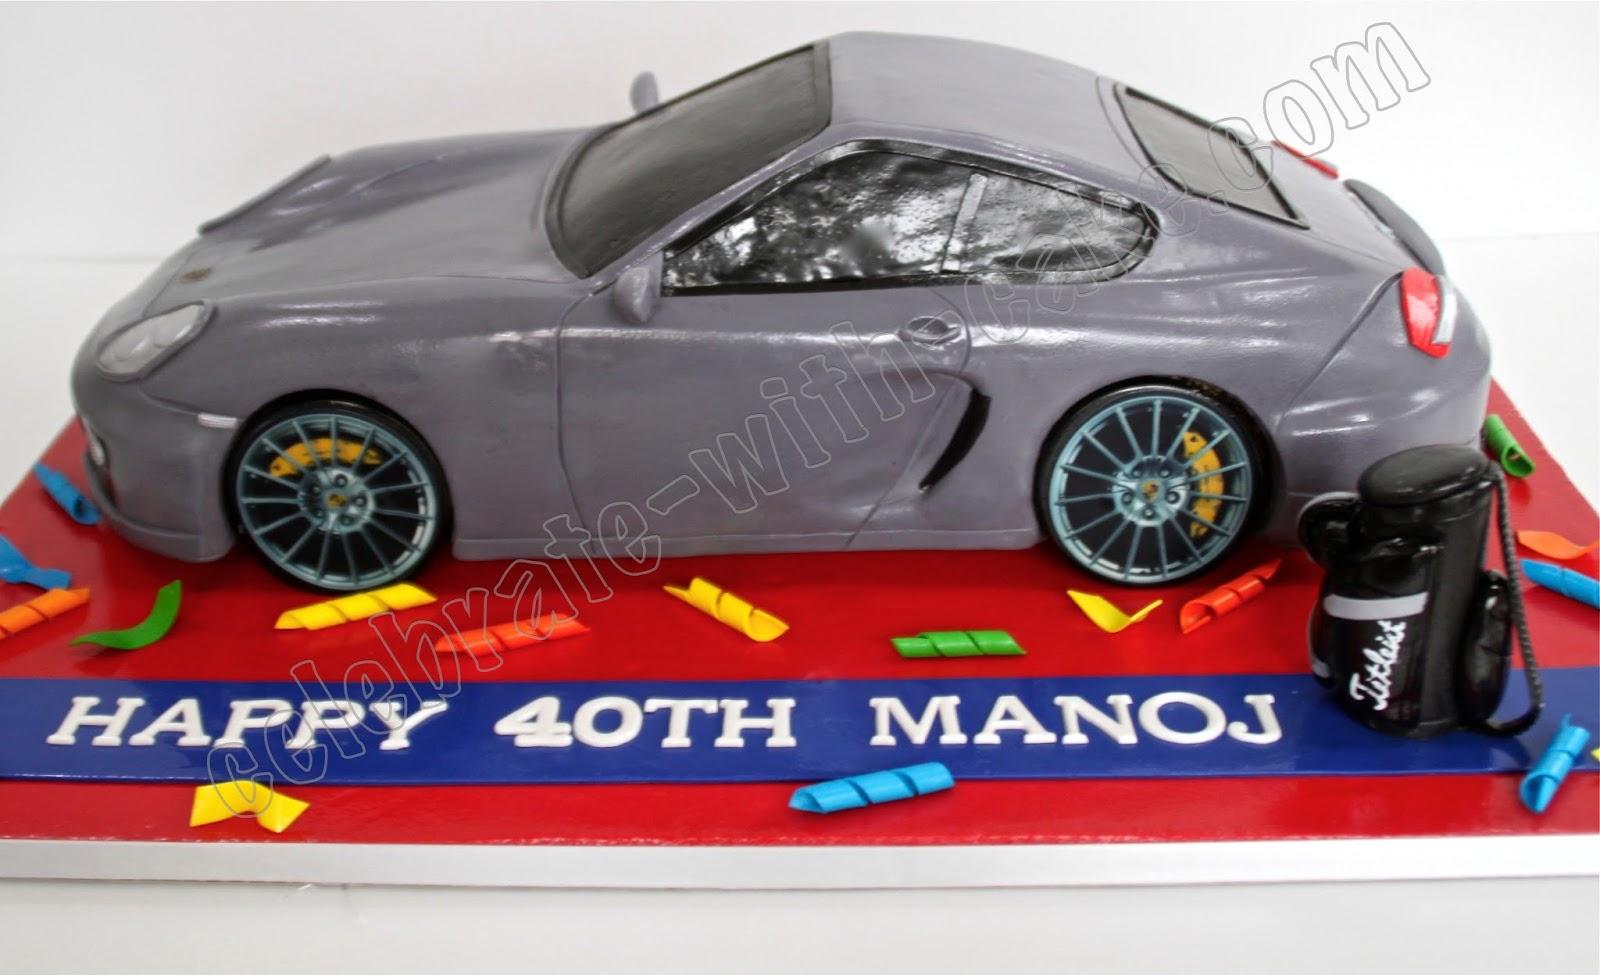 Celebrate with Cake Sculpted Porsche Cayman S Car Cake